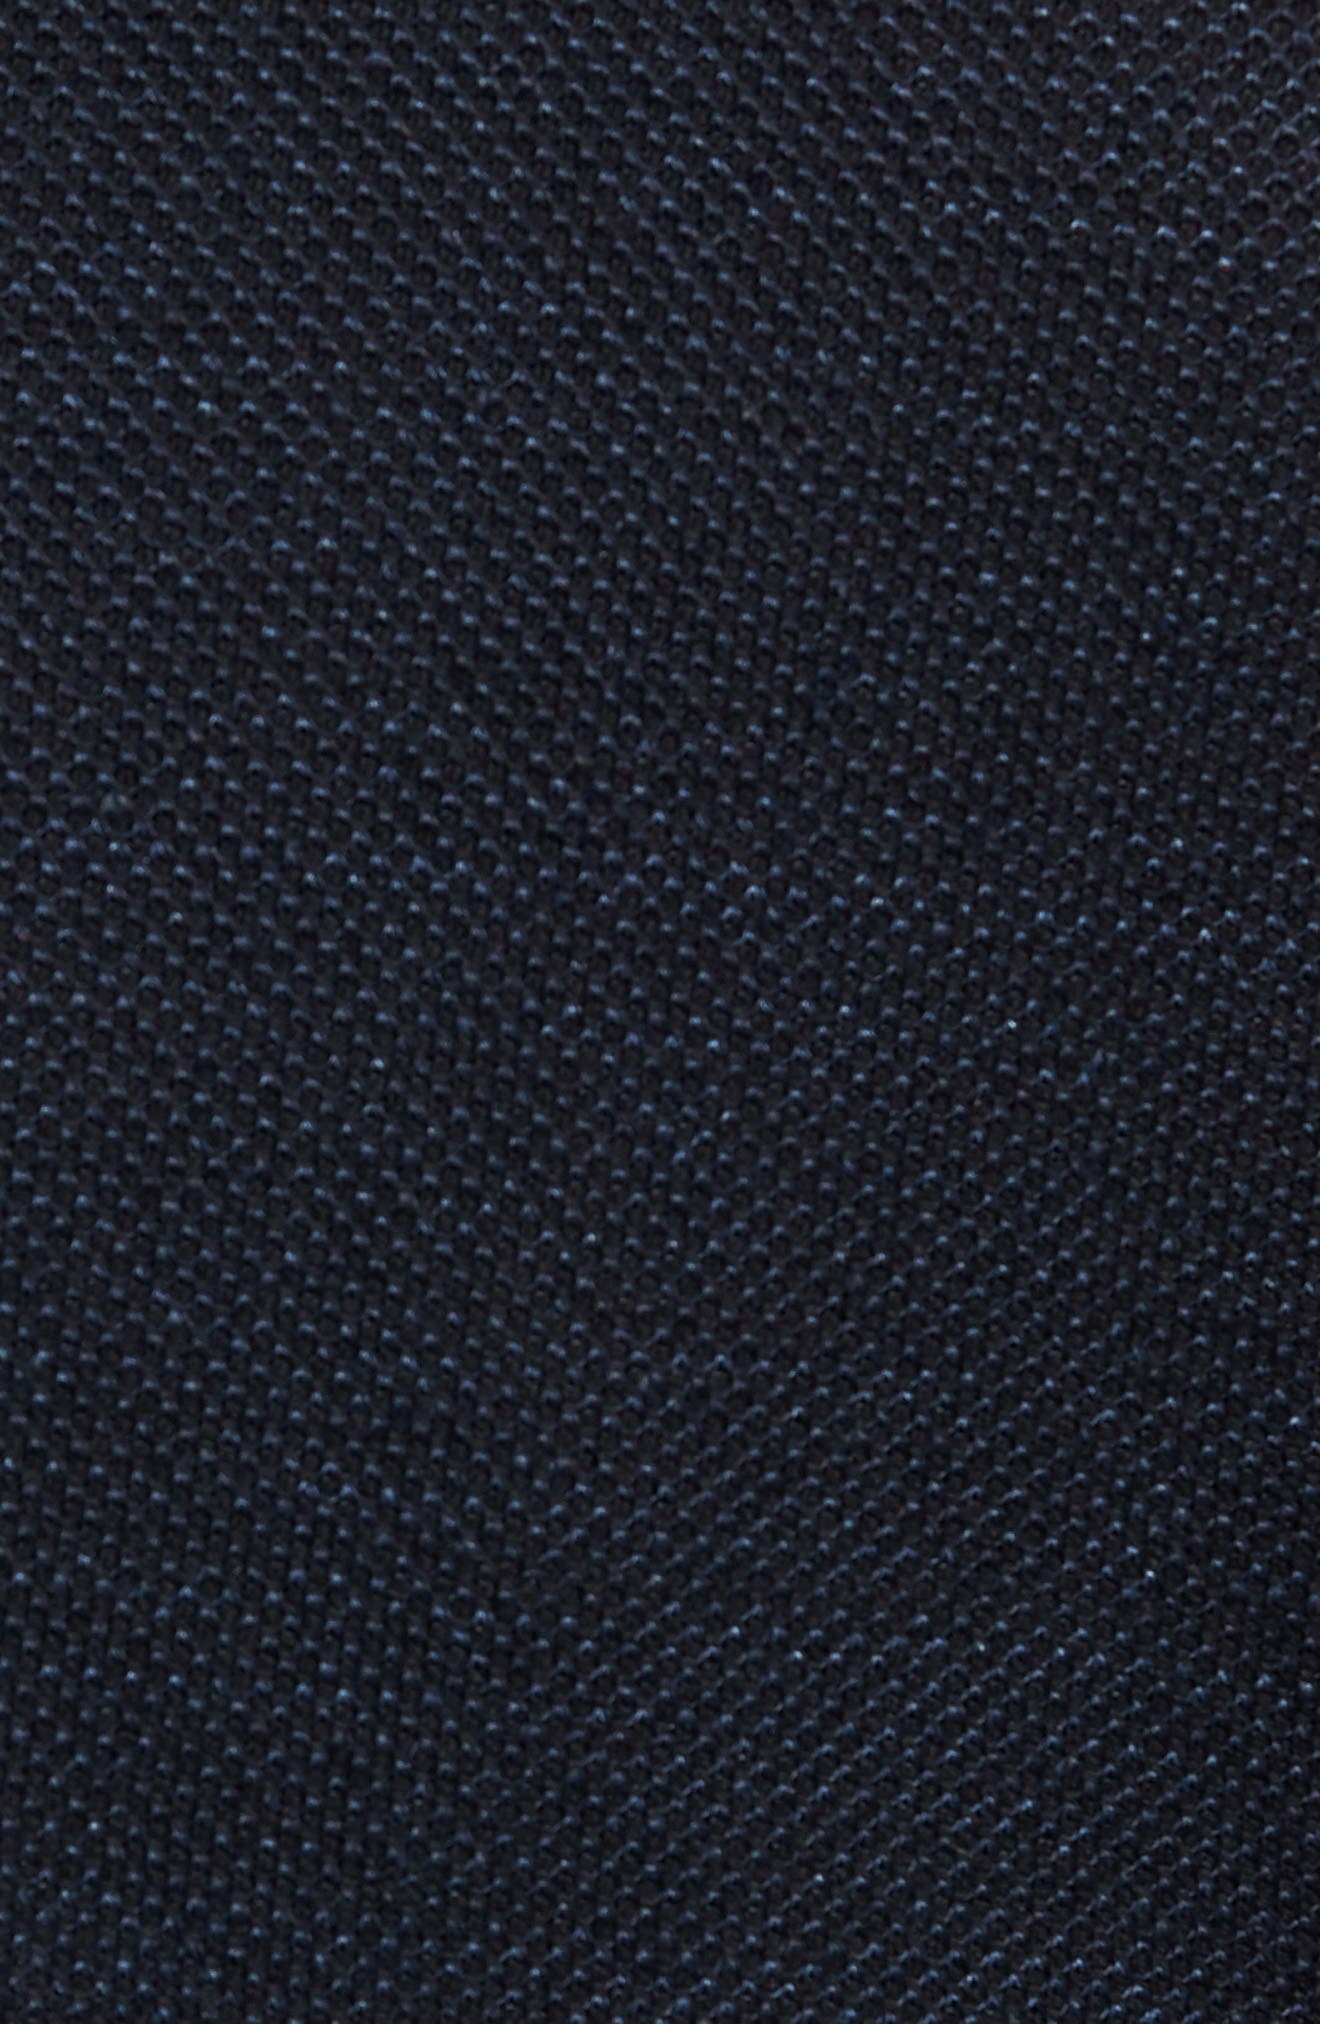 Regular Fit Cotton & Linen Blazer,                             Alternate thumbnail 6, color,                             405